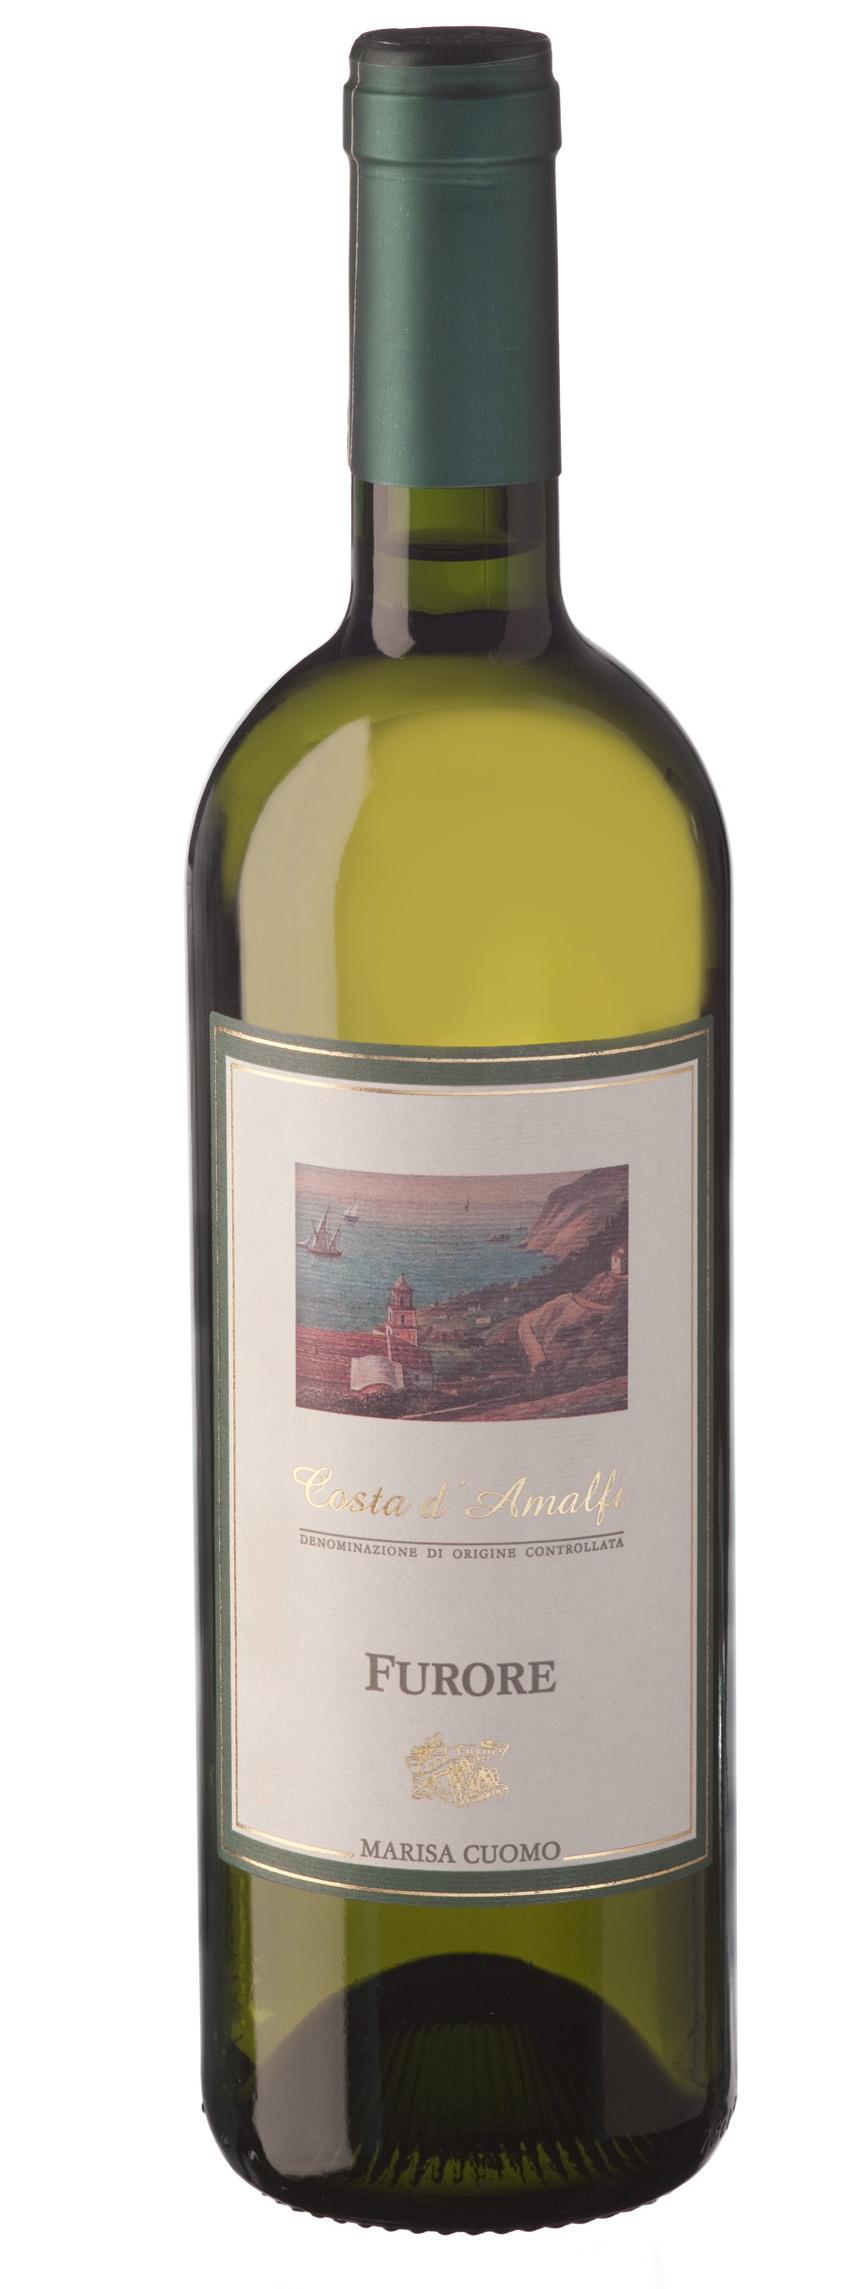 """Furore"" Costa d'Amalfi Bianco 2020 750 ML Marisa Cuomo"